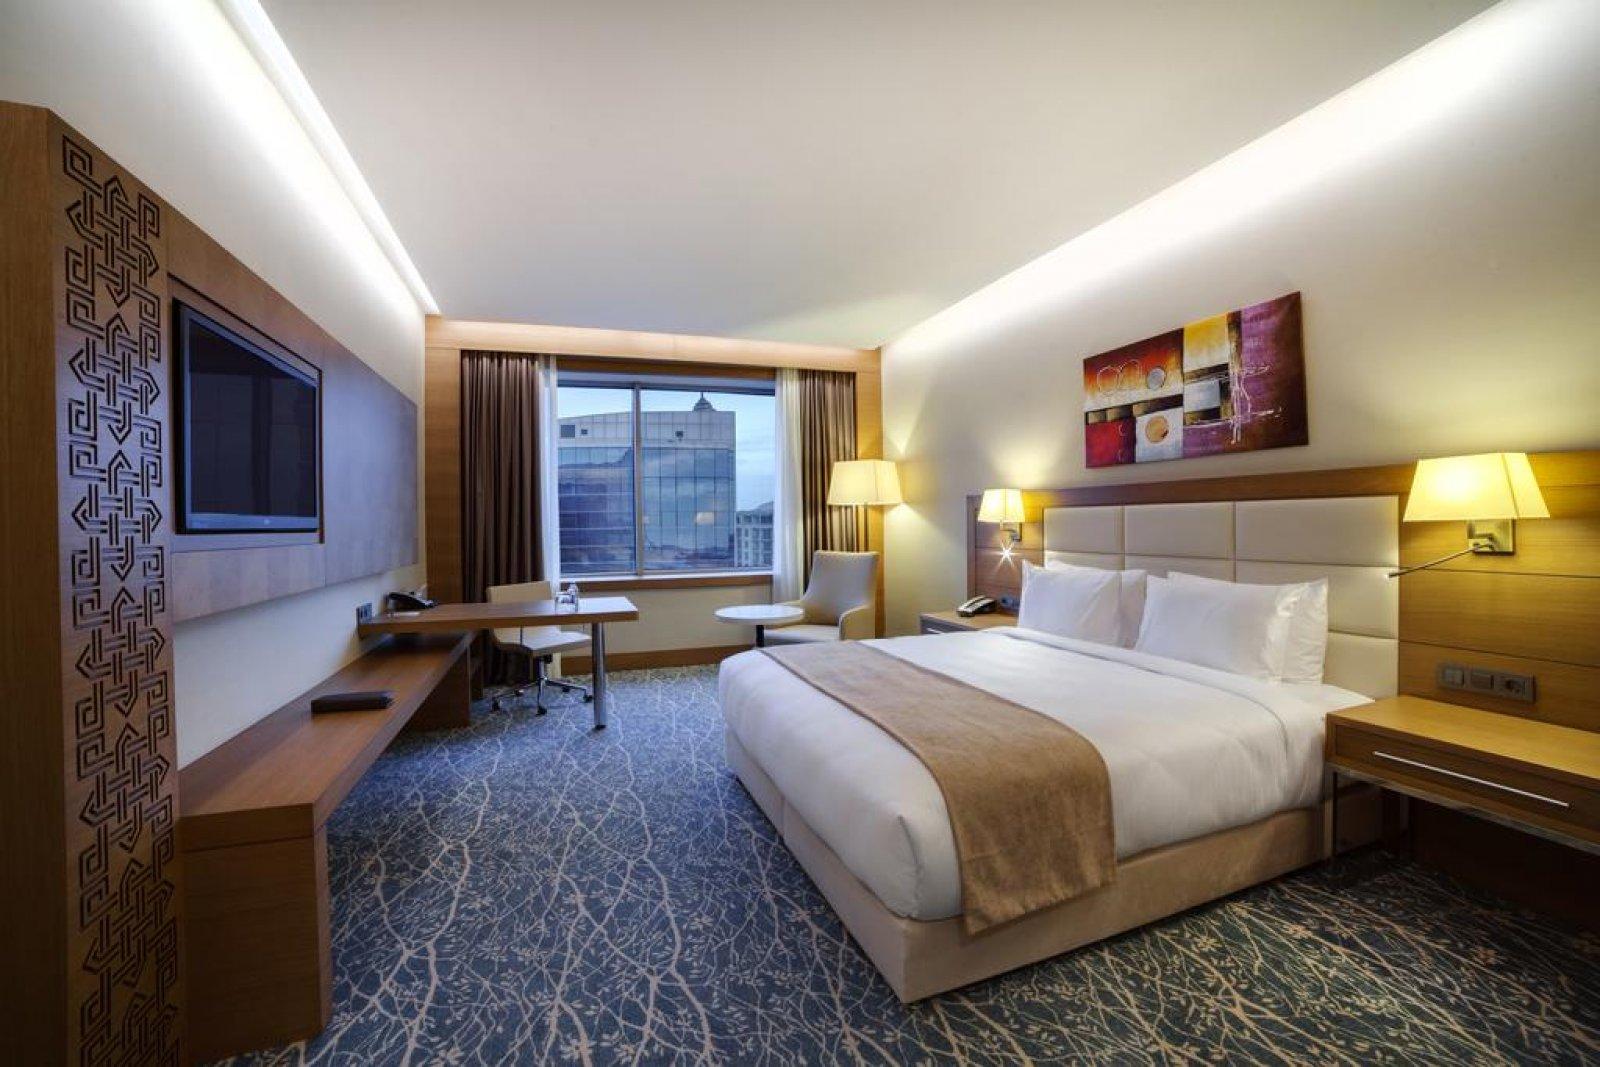 Baku Holiday Inn Otel, Azerbaycan